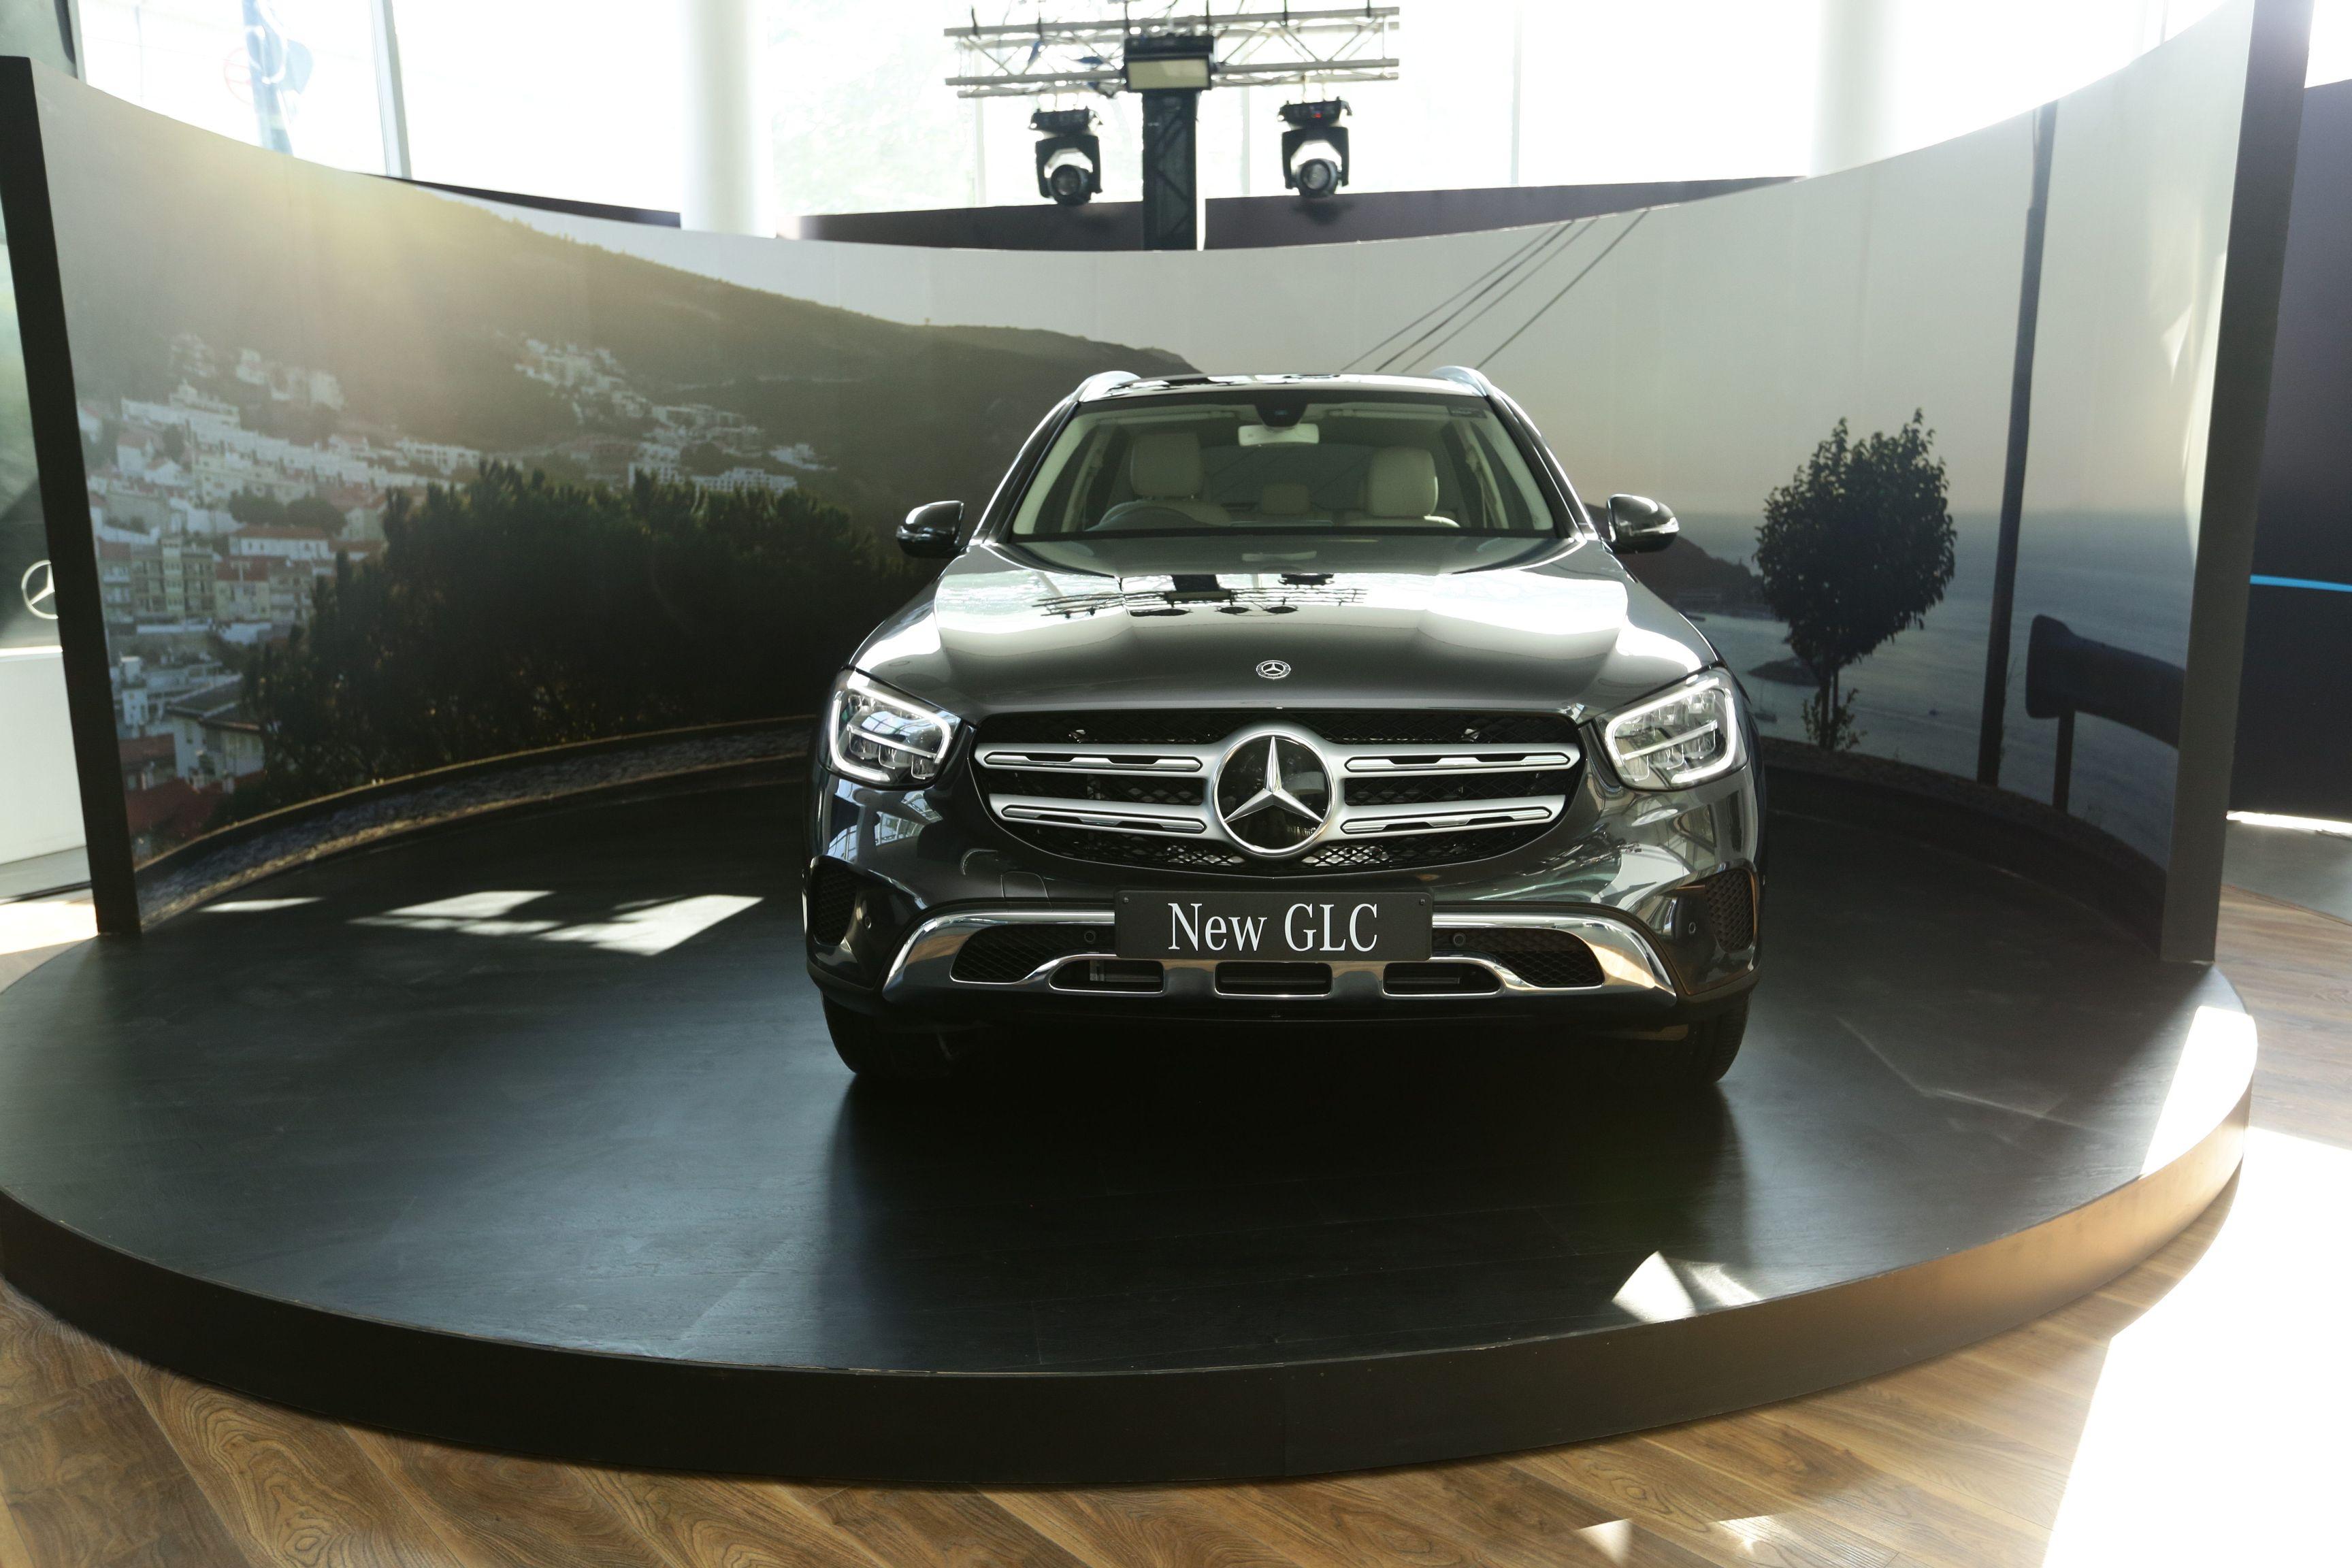 Mercedes-Benz launches new GLC SUV variants   Deccan Herald